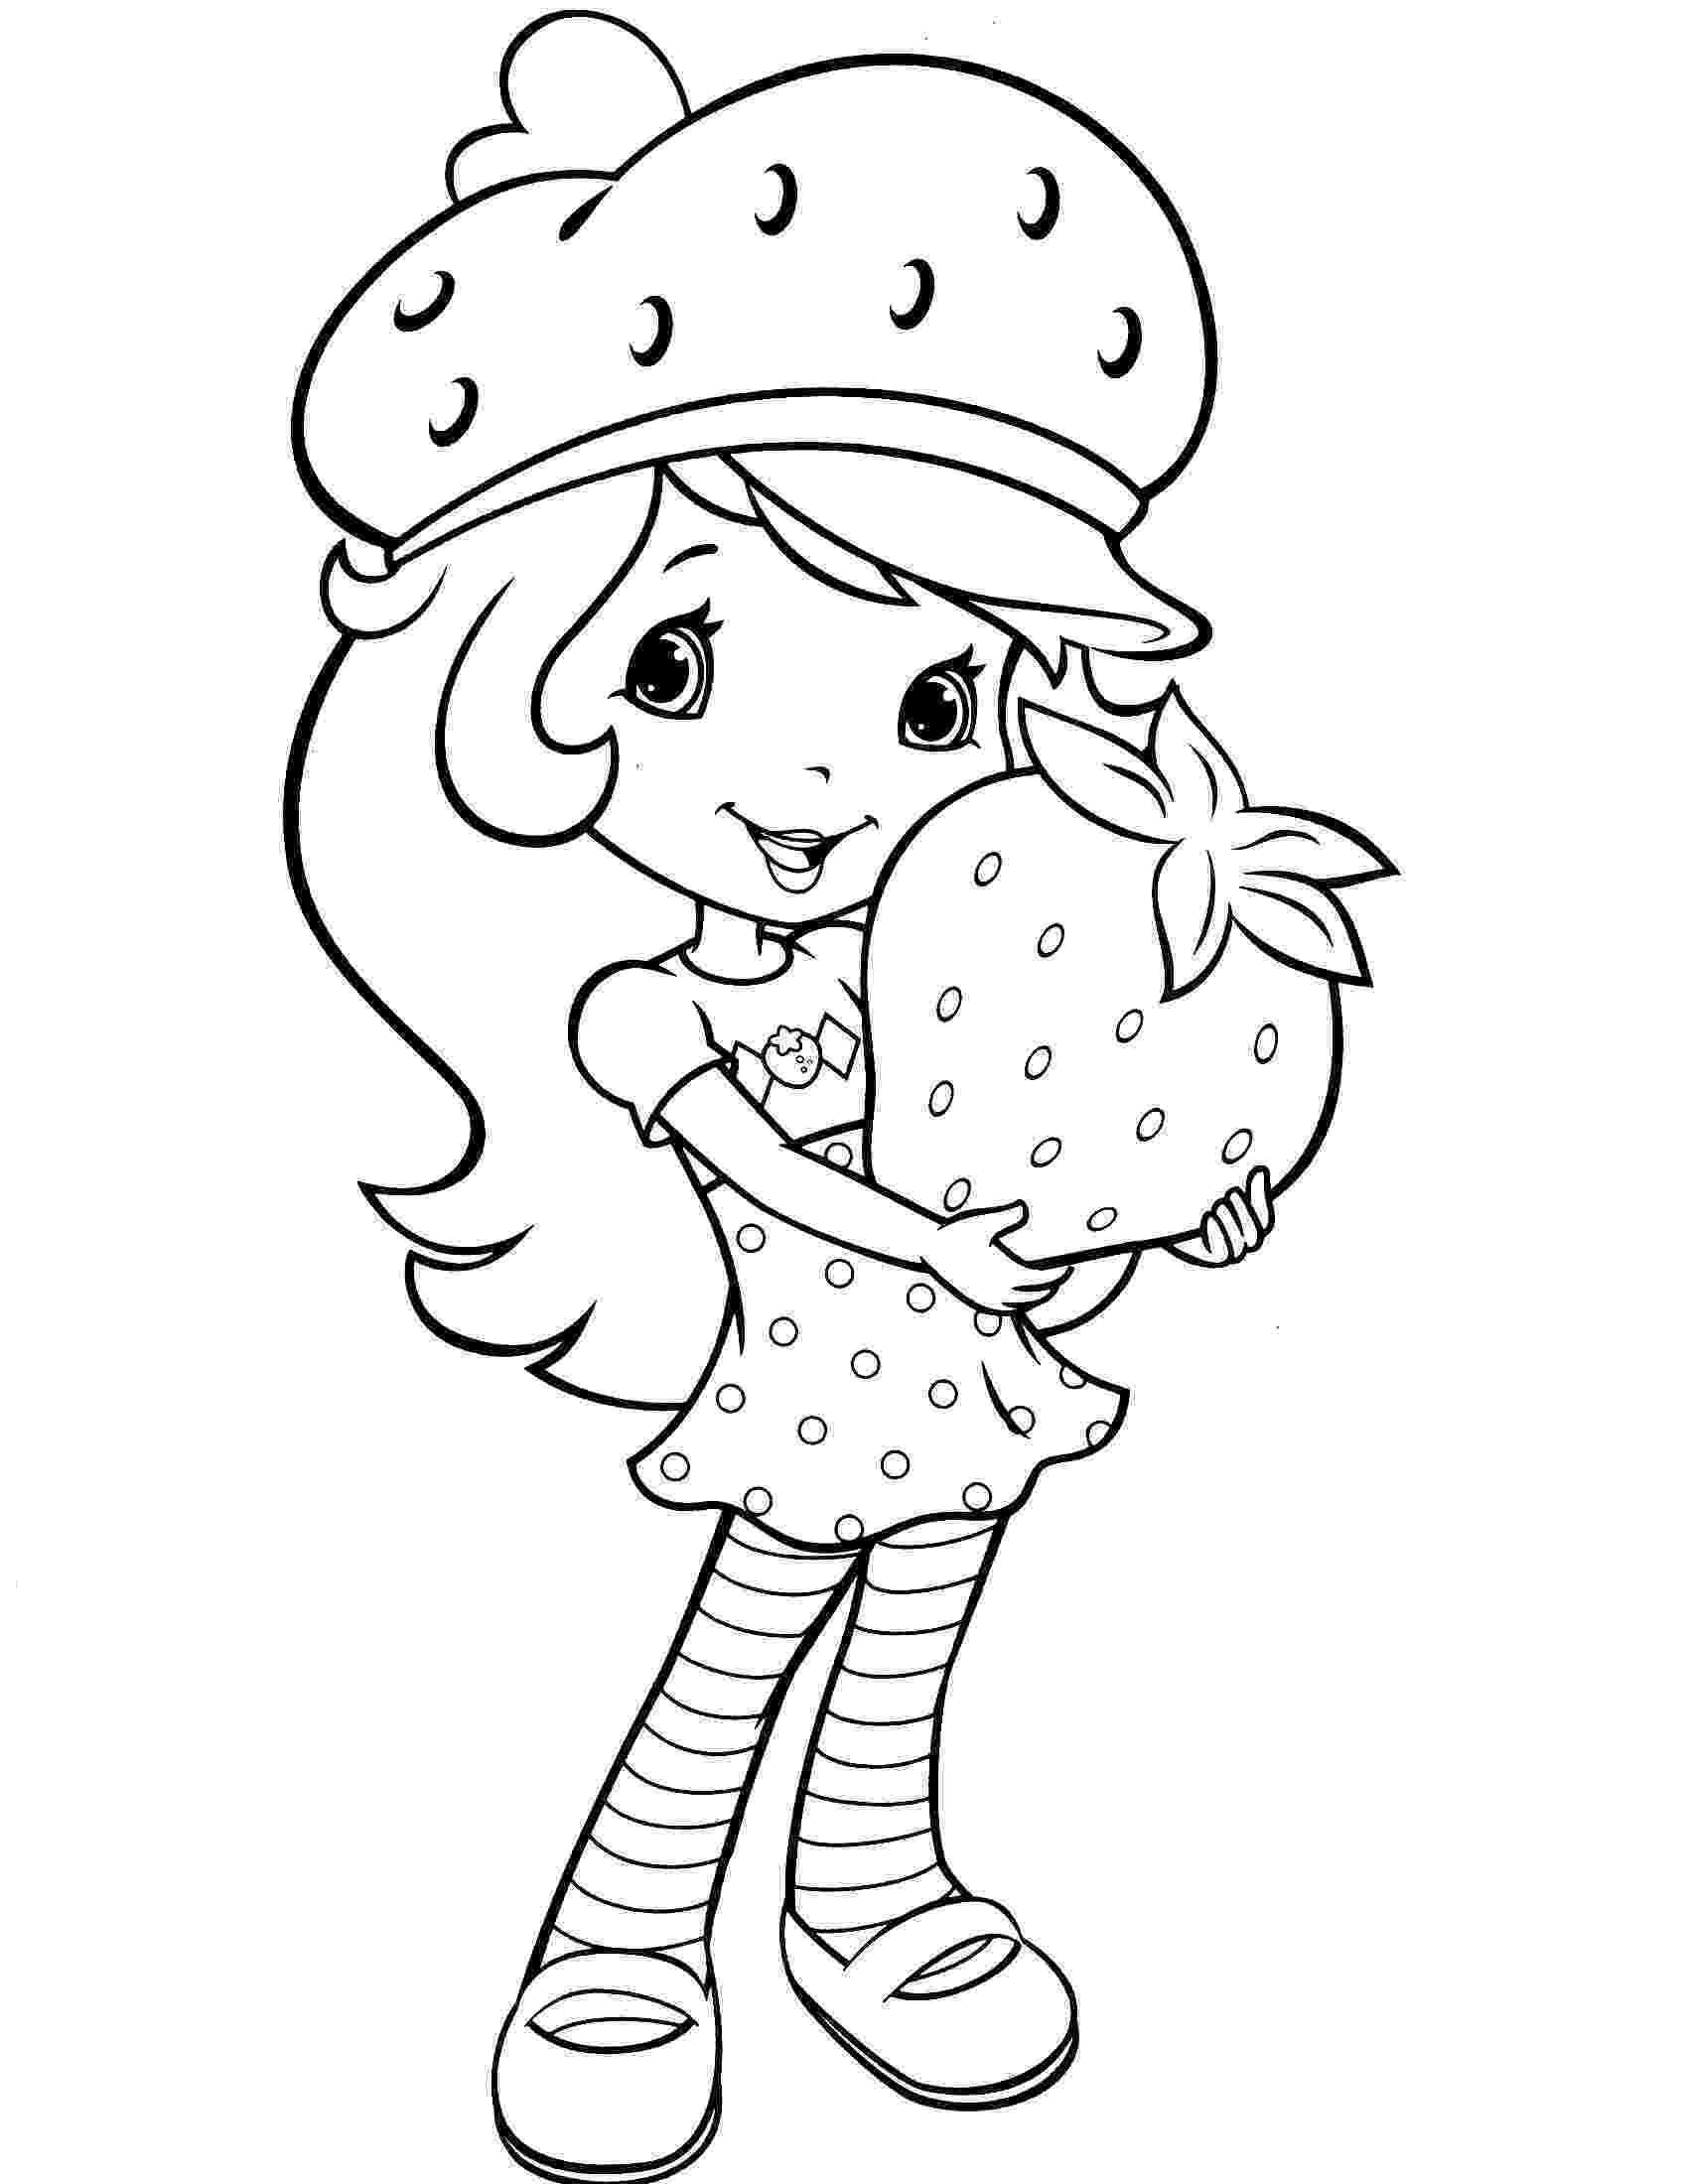 strawberry coloring pages strawberry coloring pages getcoloringpagescom strawberry coloring pages